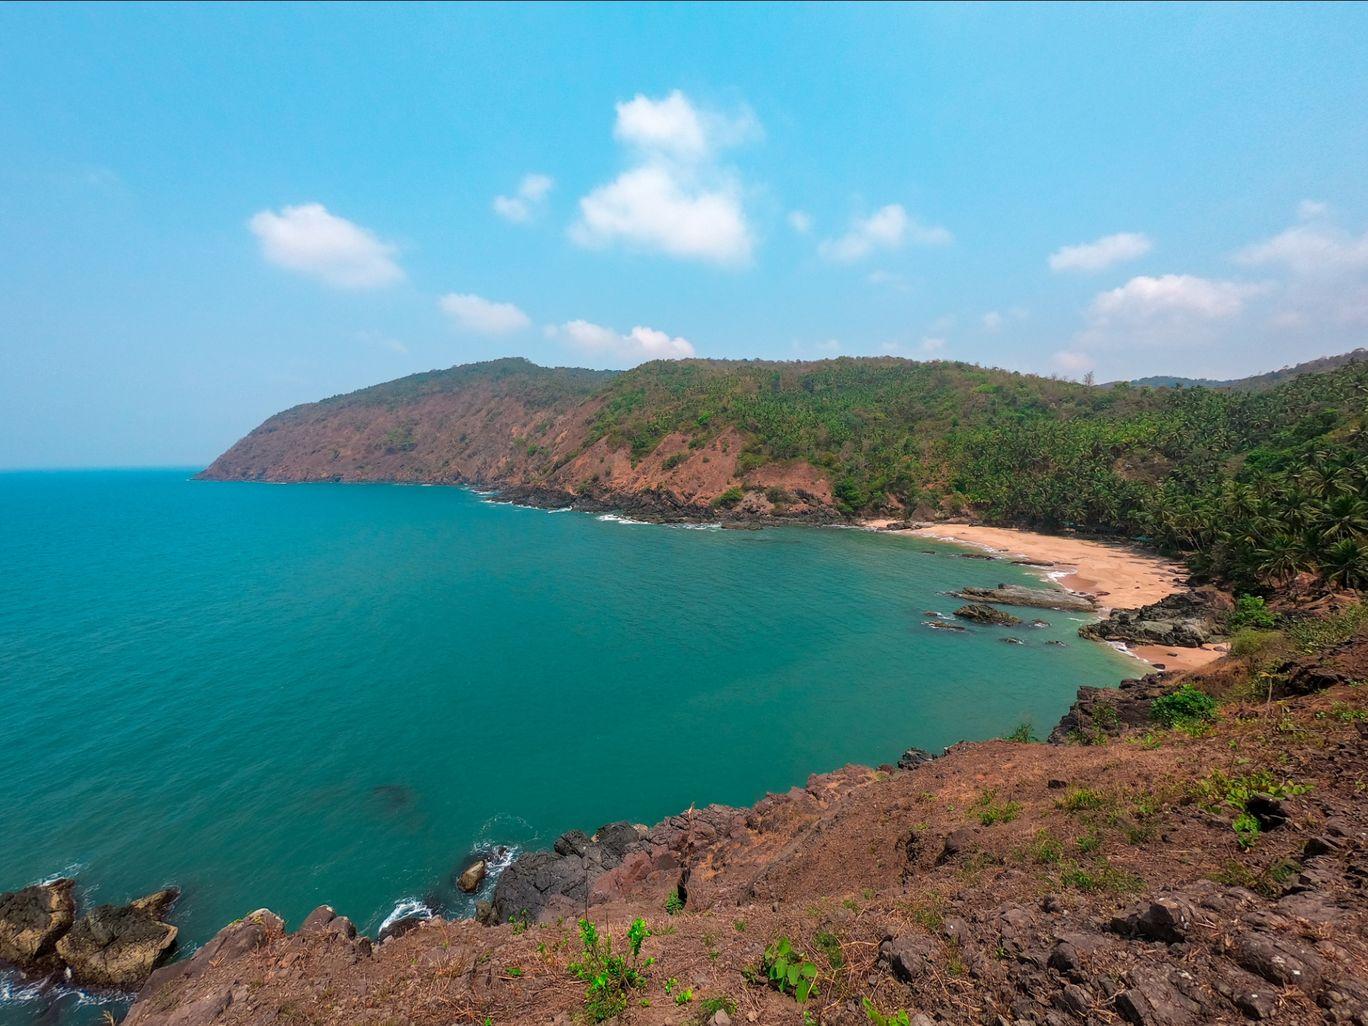 Photo of Kakolem Beach By Darren Borges